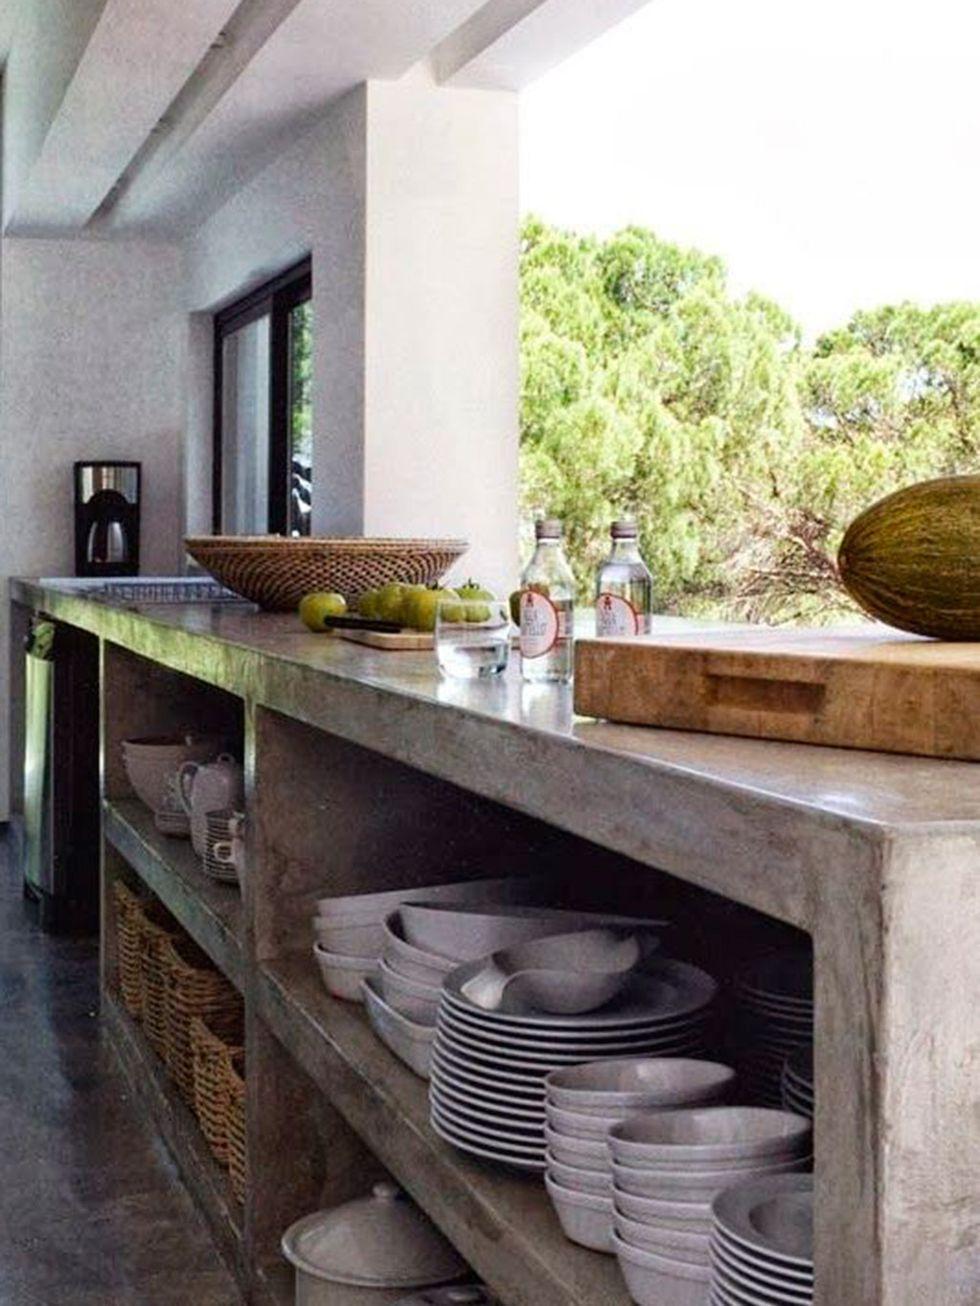 20 Cocinas De Exterior Cocinas Cocina De Concreto Cocinas De Obra